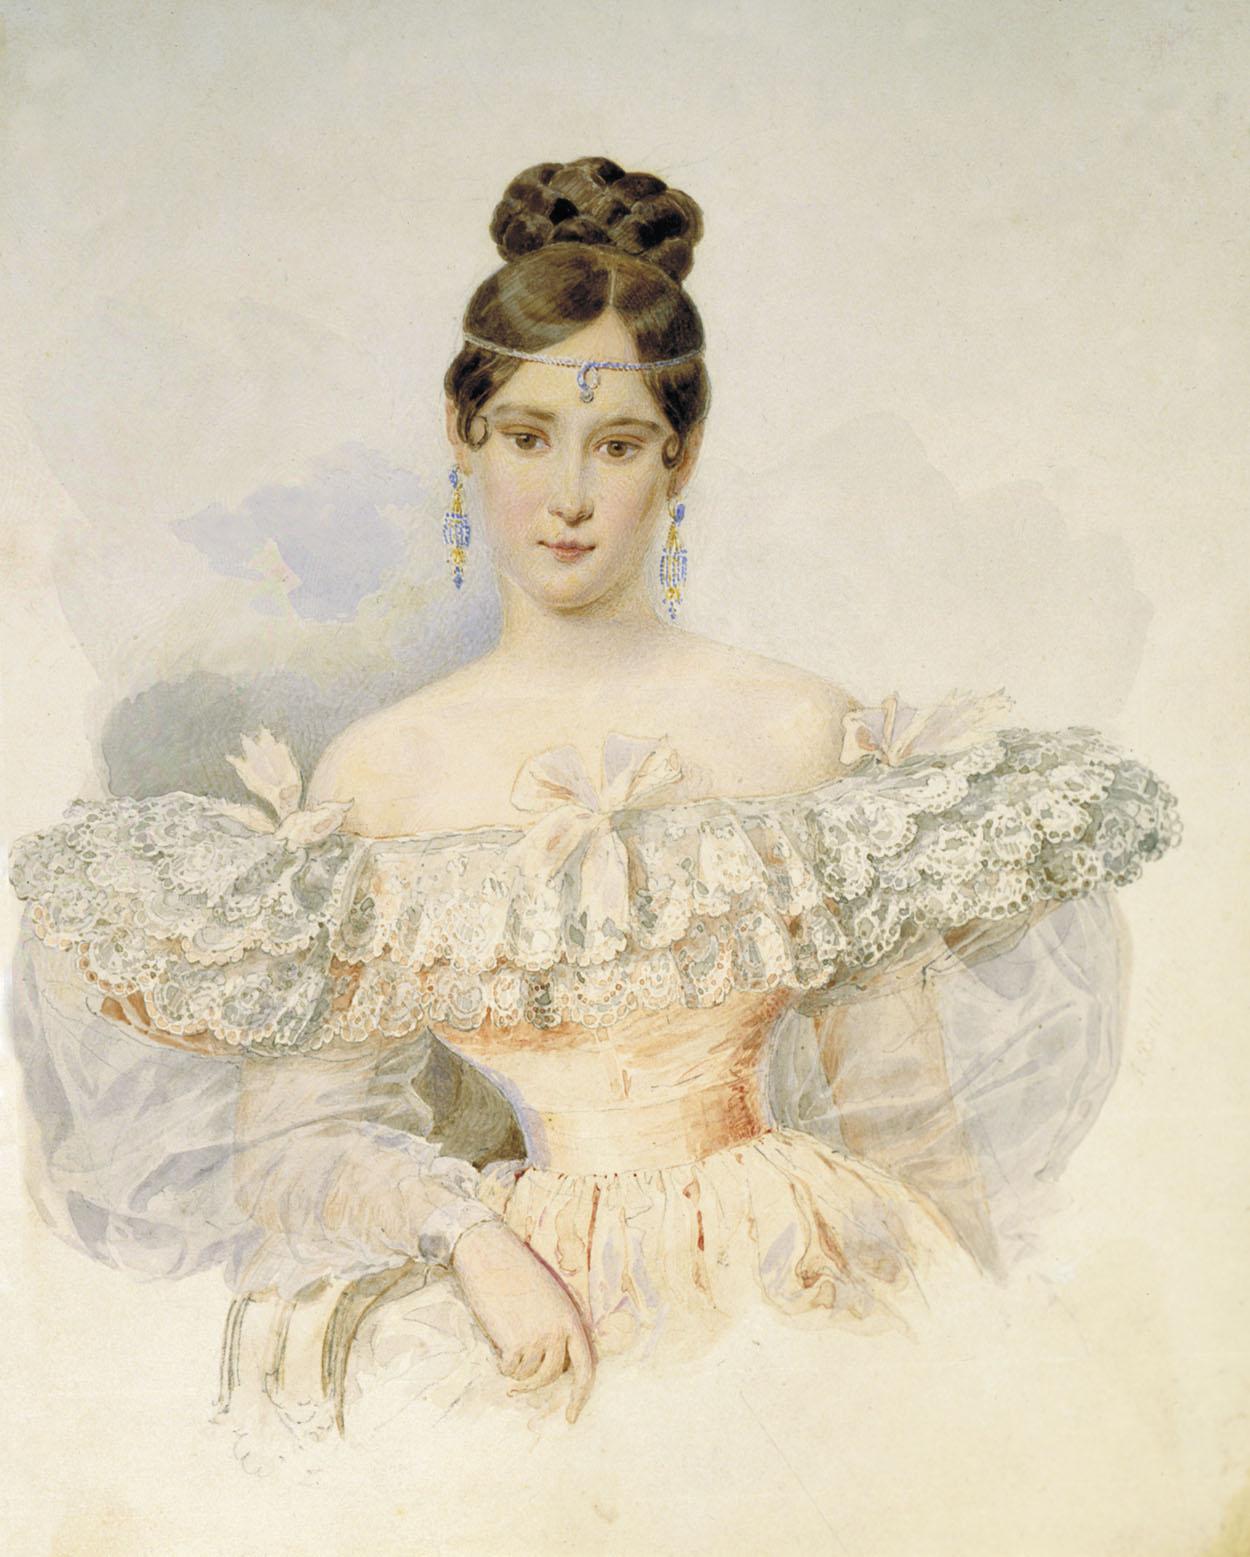 Alexander Brullov. Natalia Pushkina. 1831-1832. Museo Nacional Pushkin. Moscú.